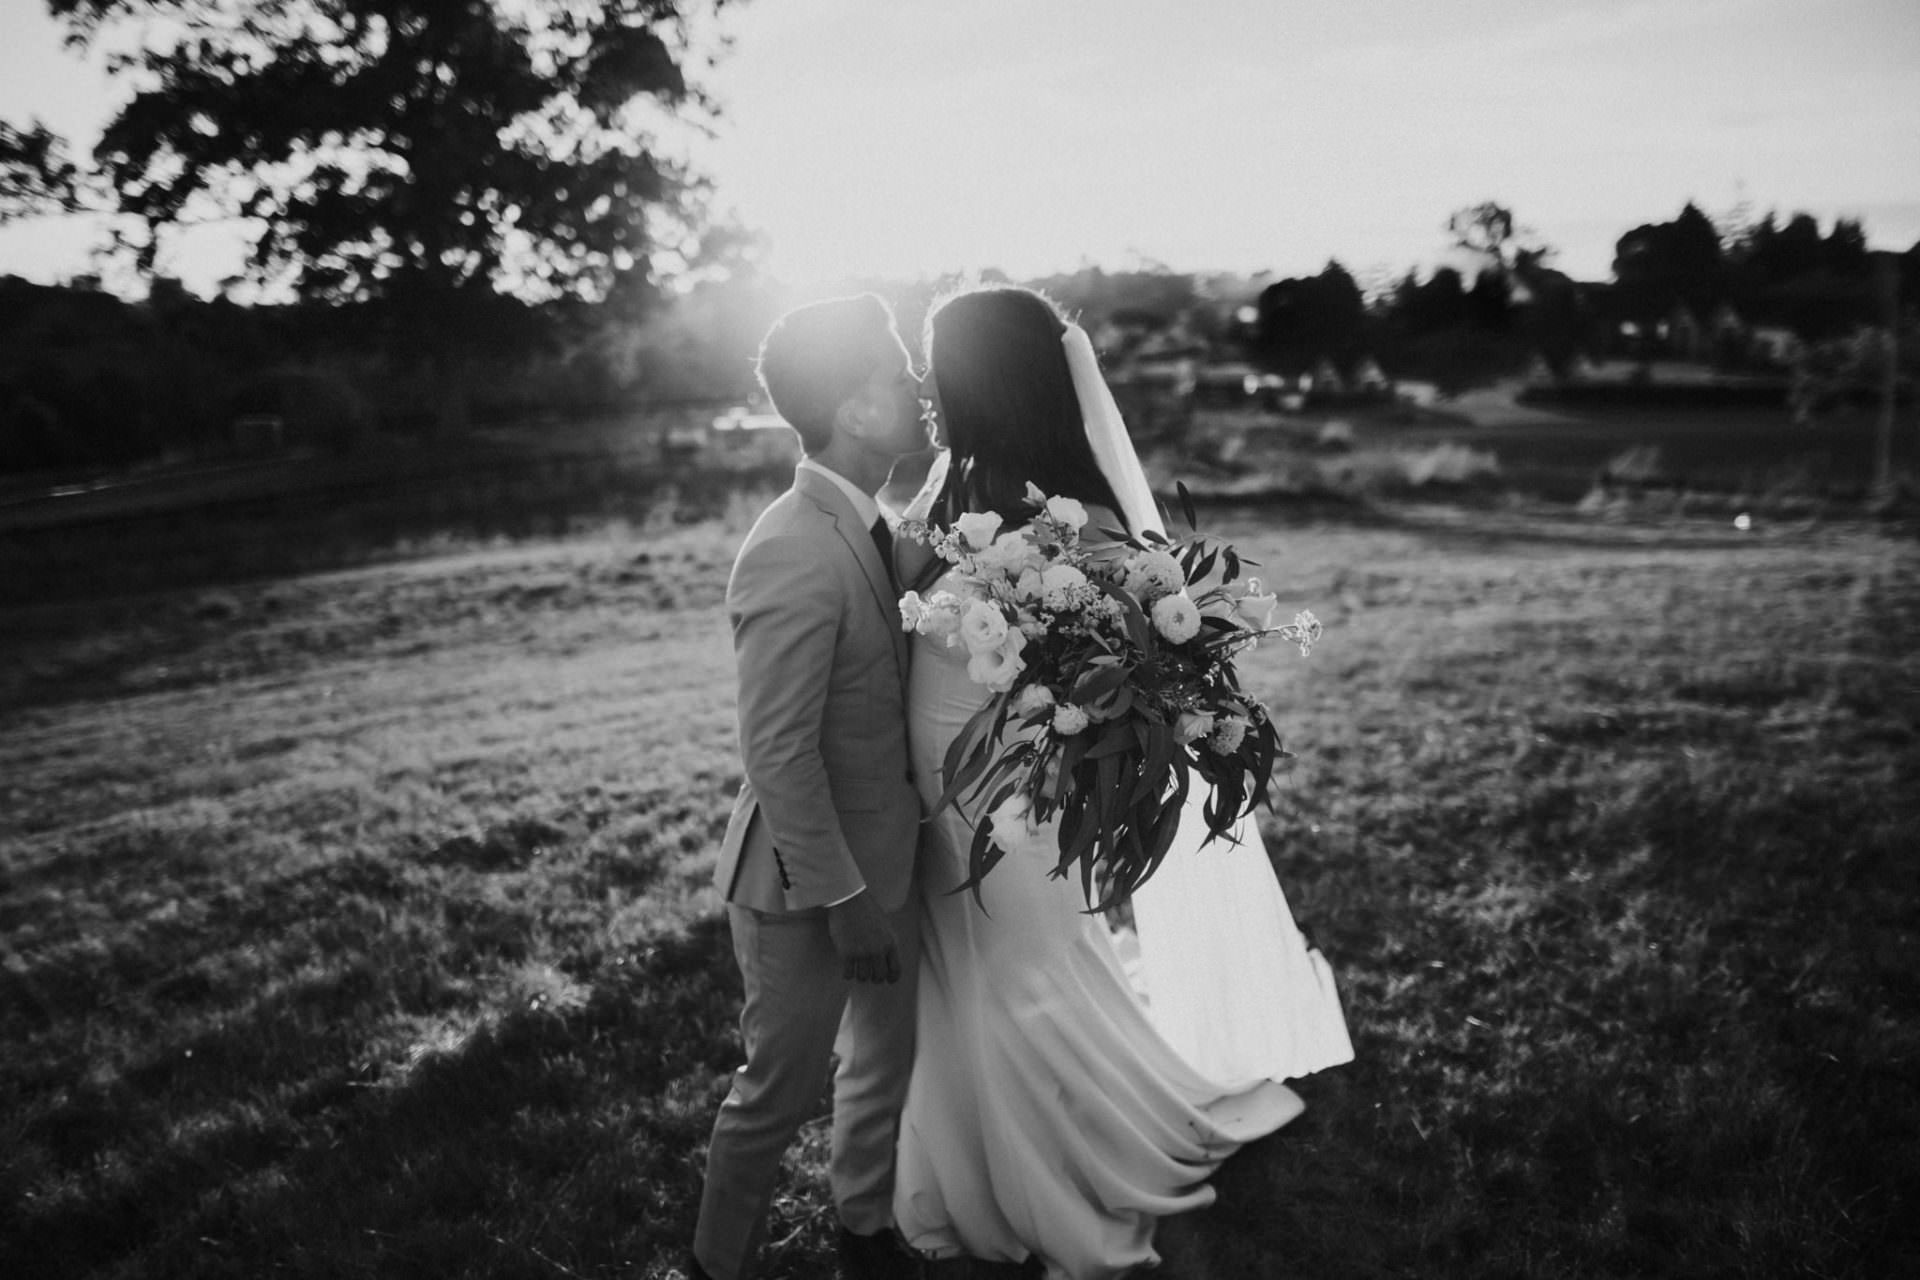 Black and white sunset wedding photograph